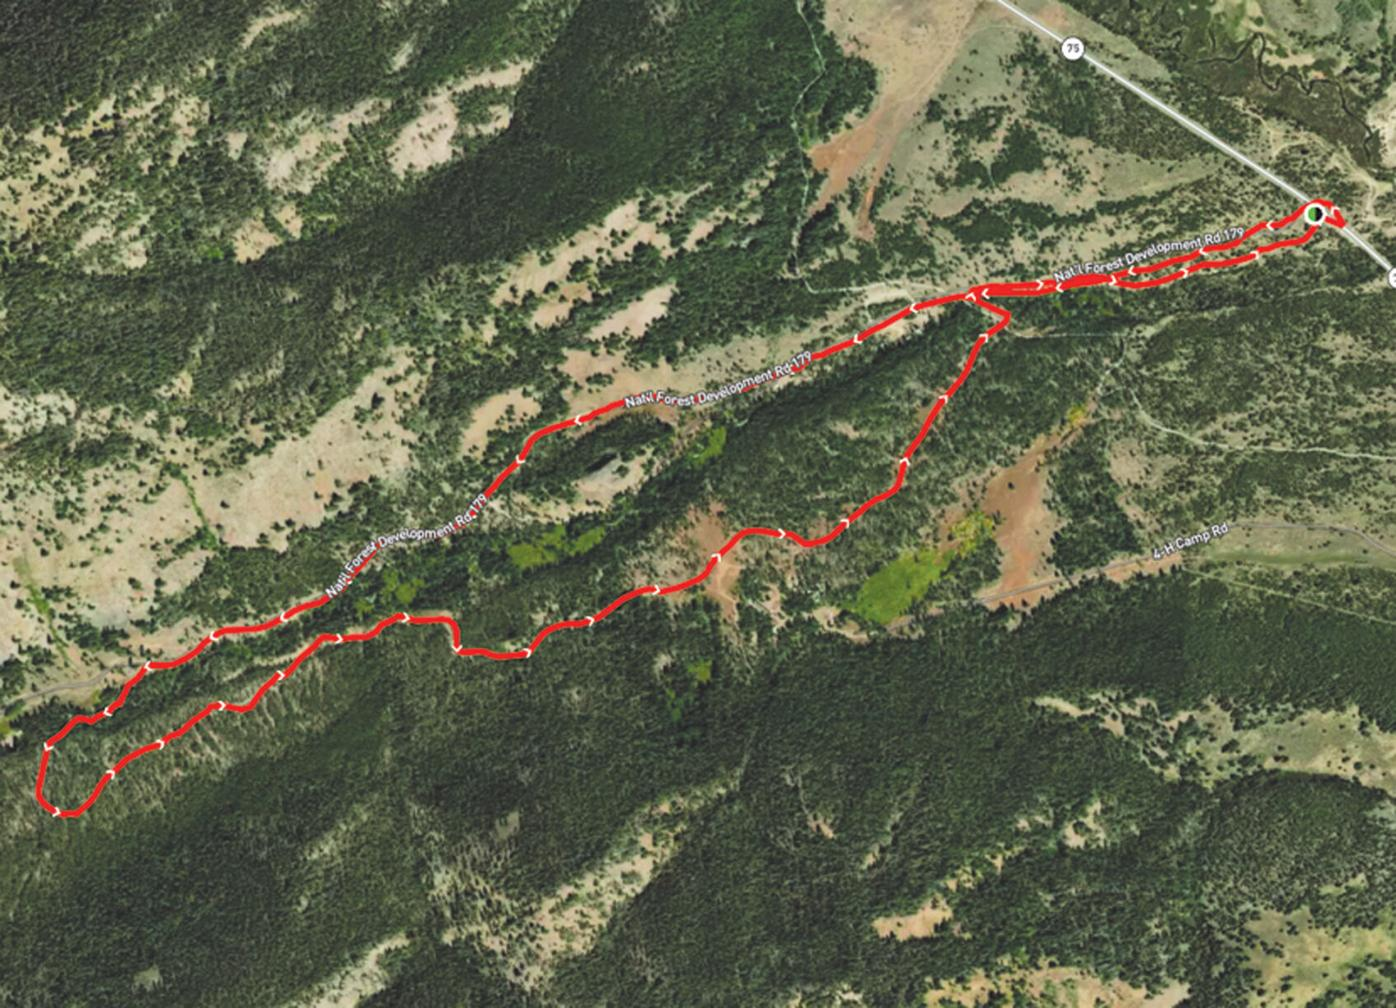 21-07-21 Fern Baird trail 1.jpg